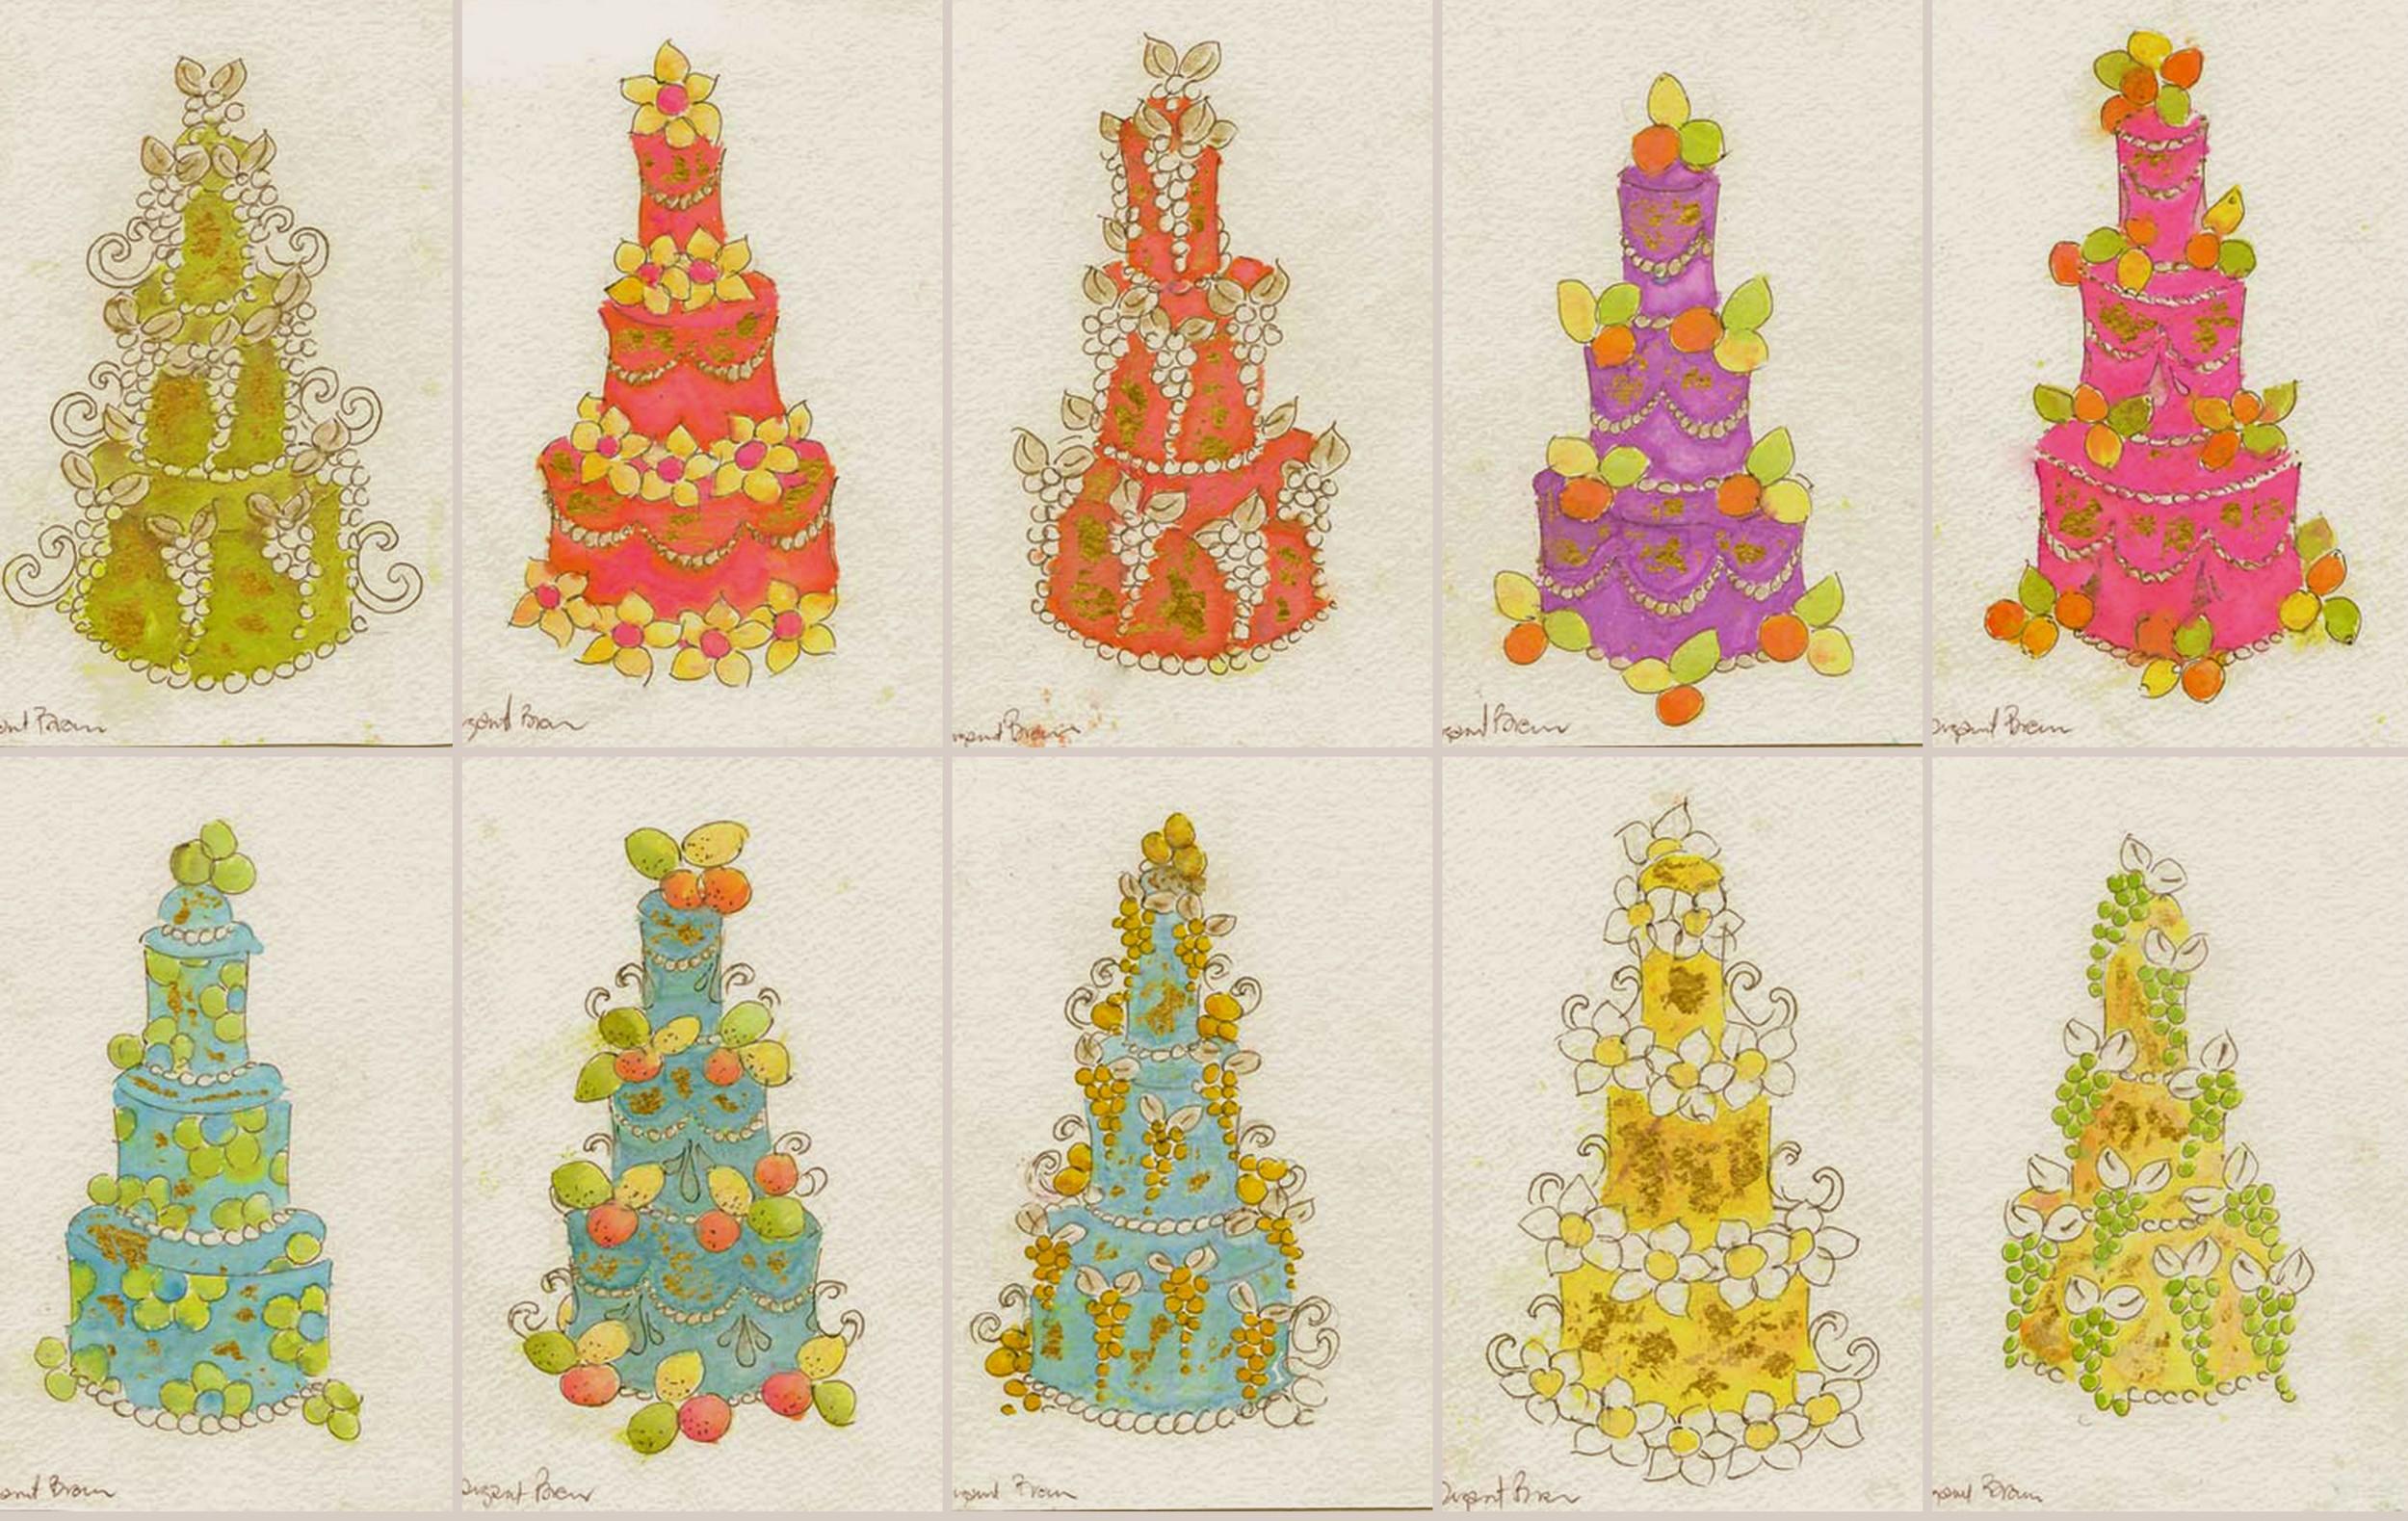 1-zenfolio art cake drawings.jpg